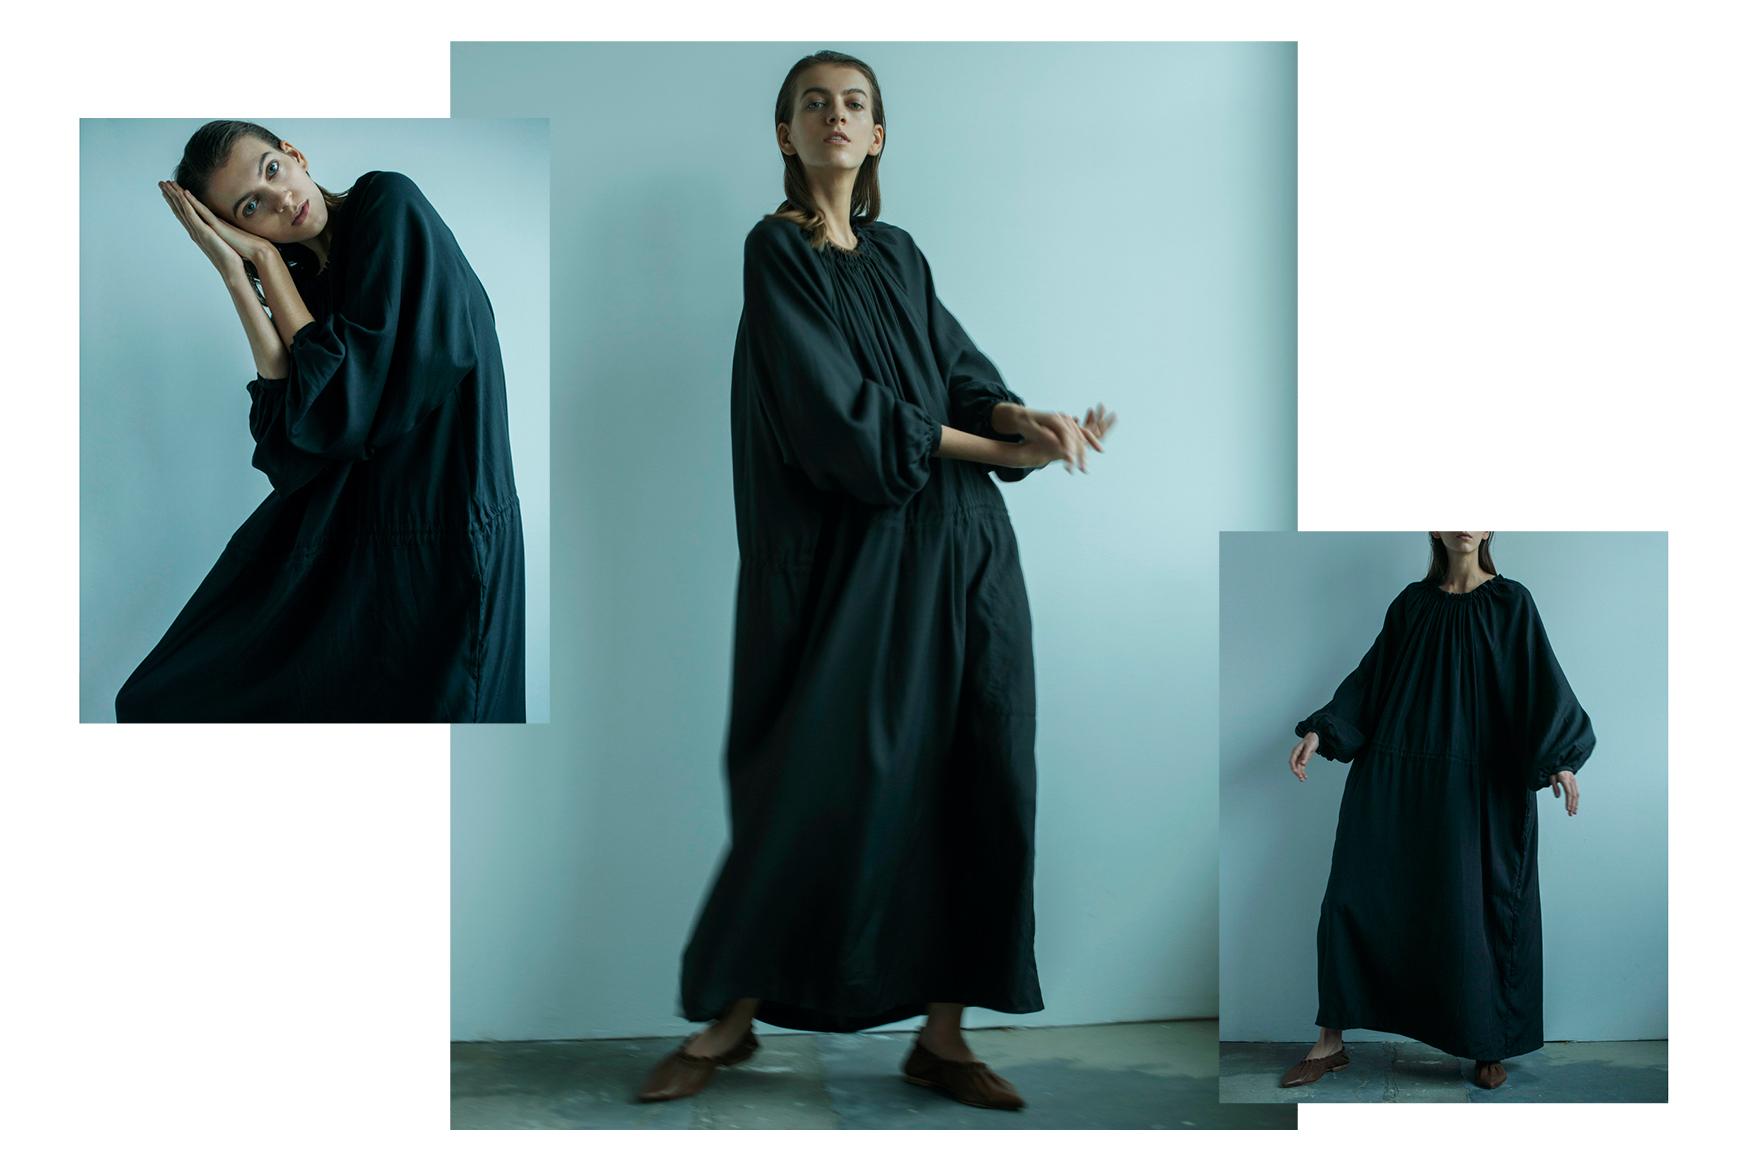 Lissome-Louise-Richardson-Anna Rosa Krau-Sustainable-Fashion34.jpg